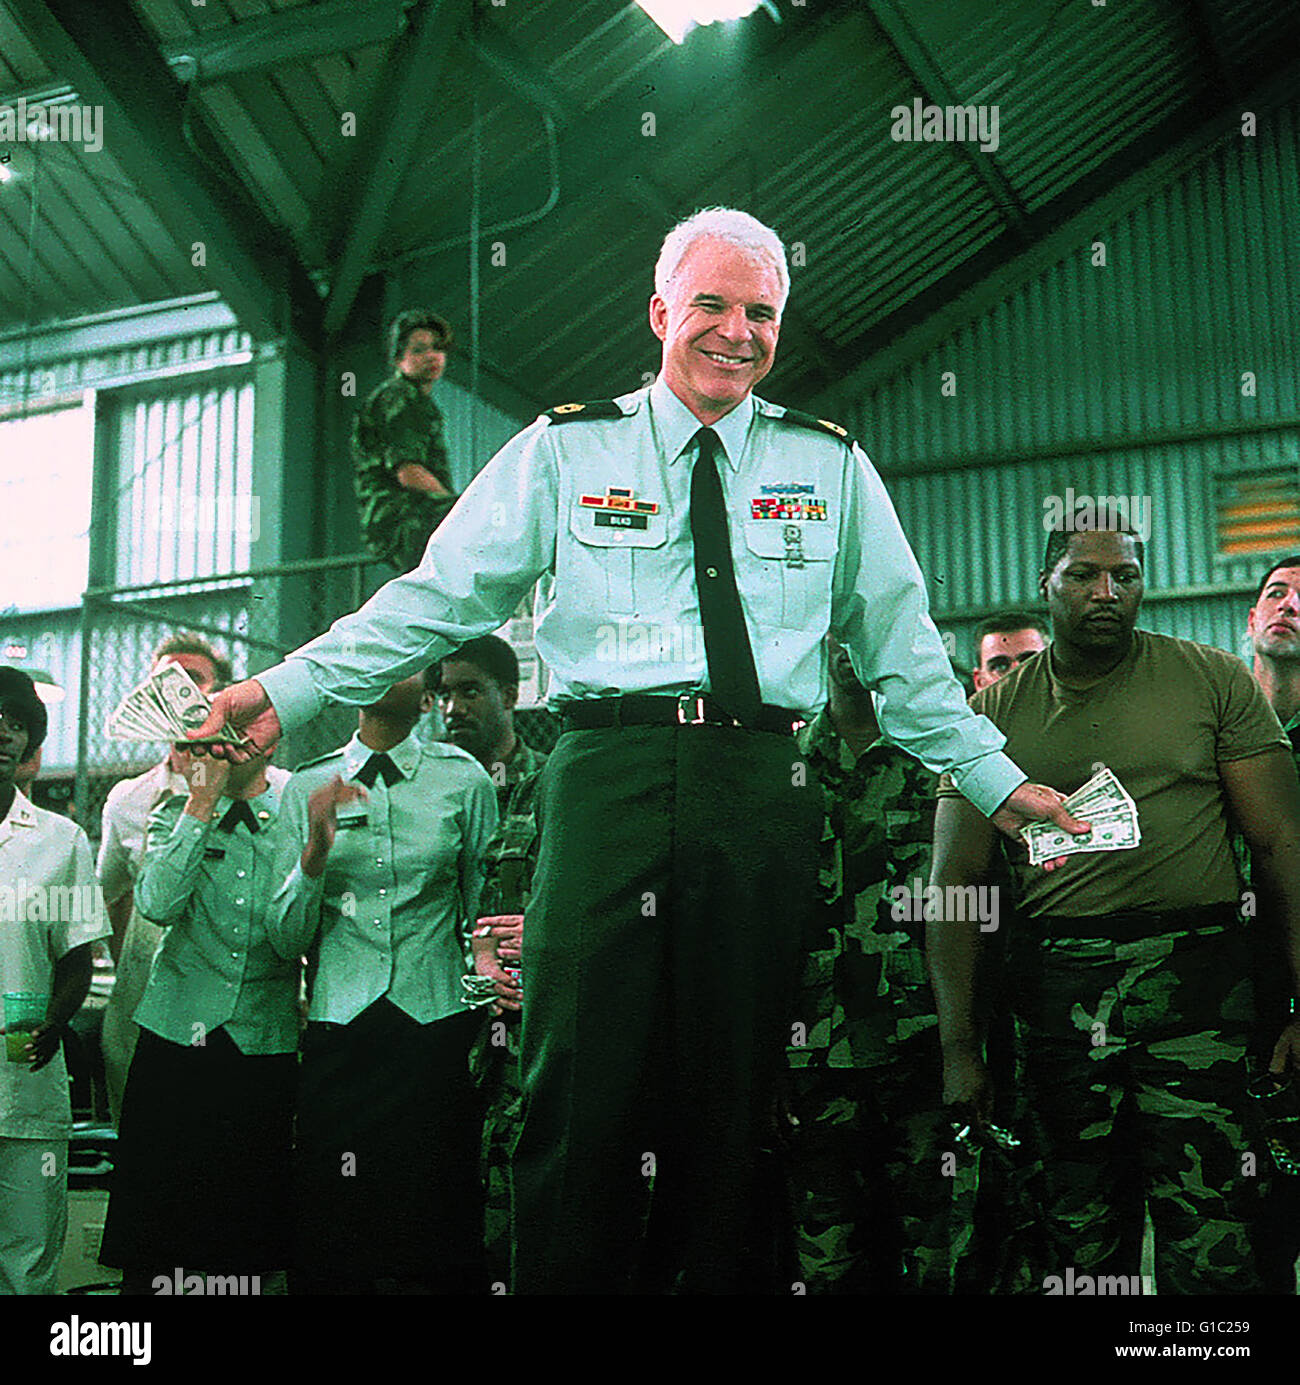 Sgt. Bilko / Steve Martin, - Stock Image